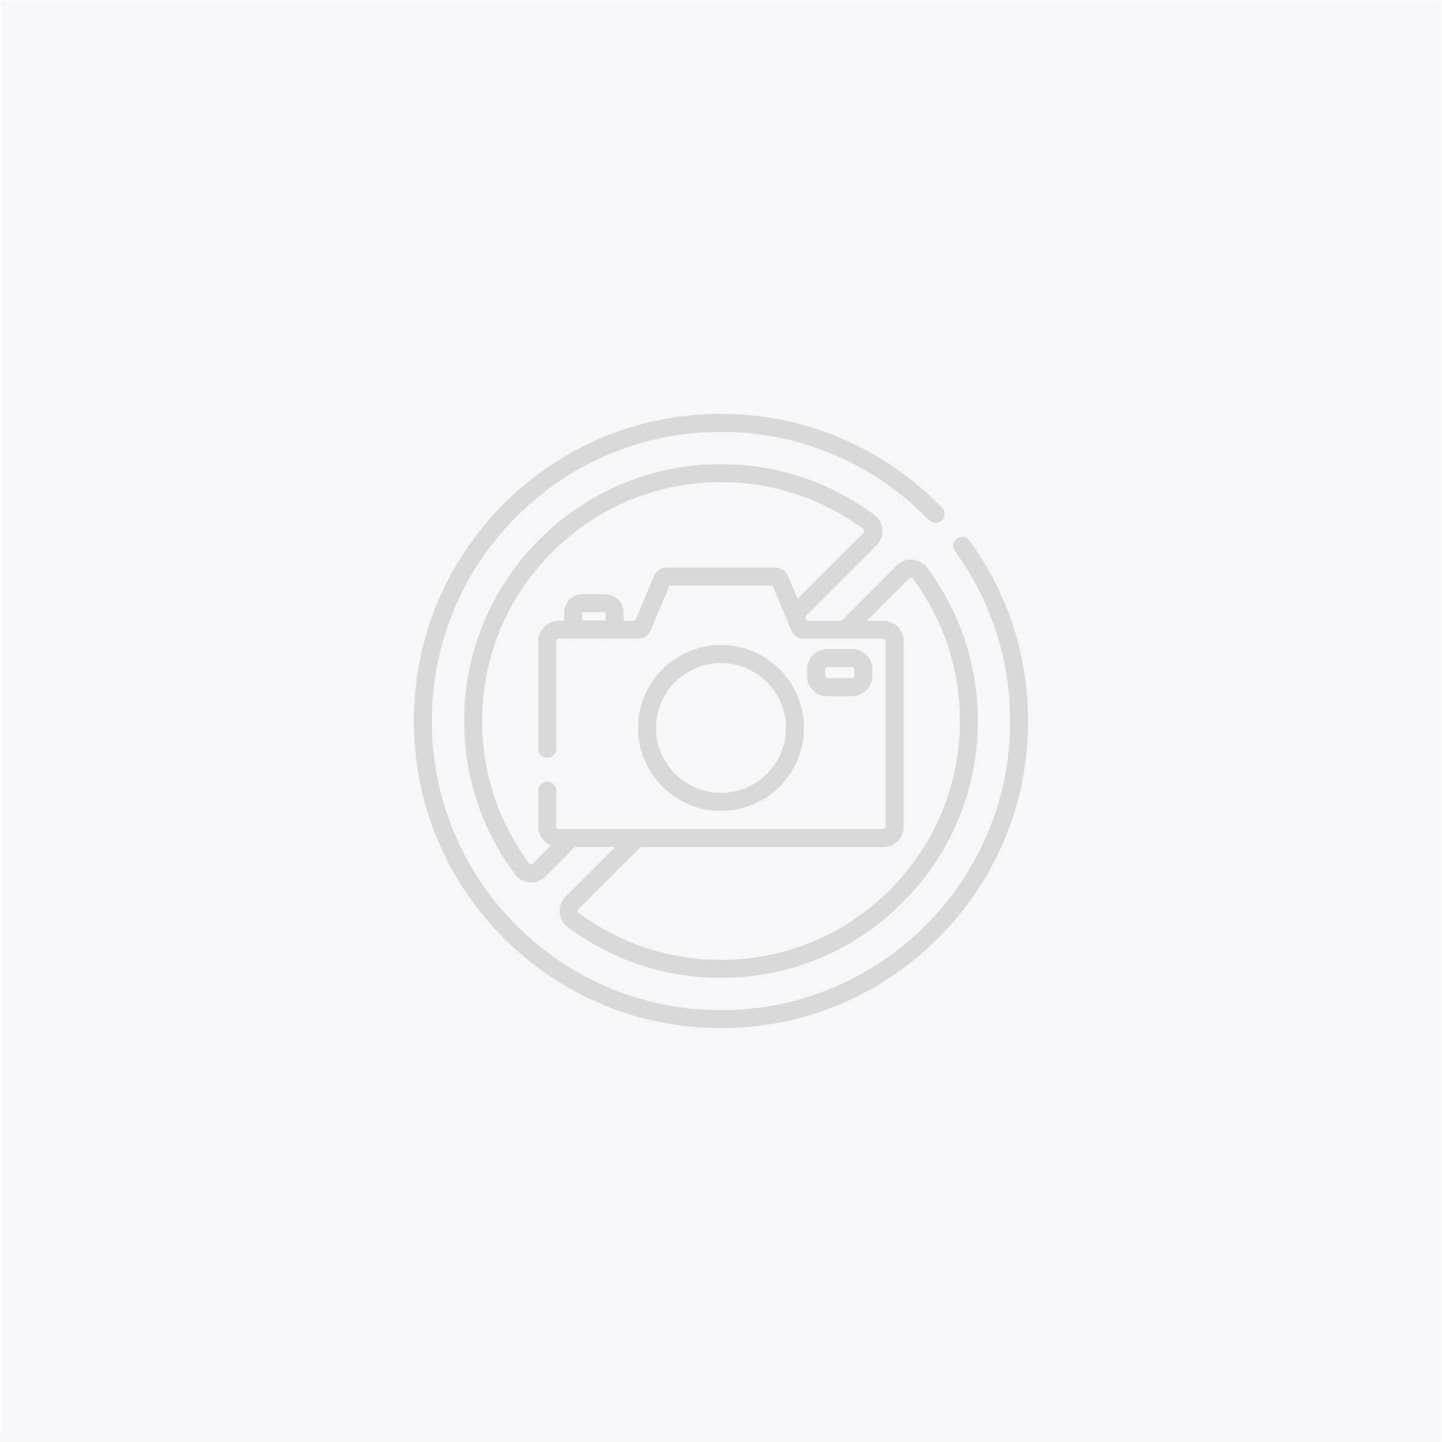 Chanel BrownReissue 226 Crossbody shop safe online